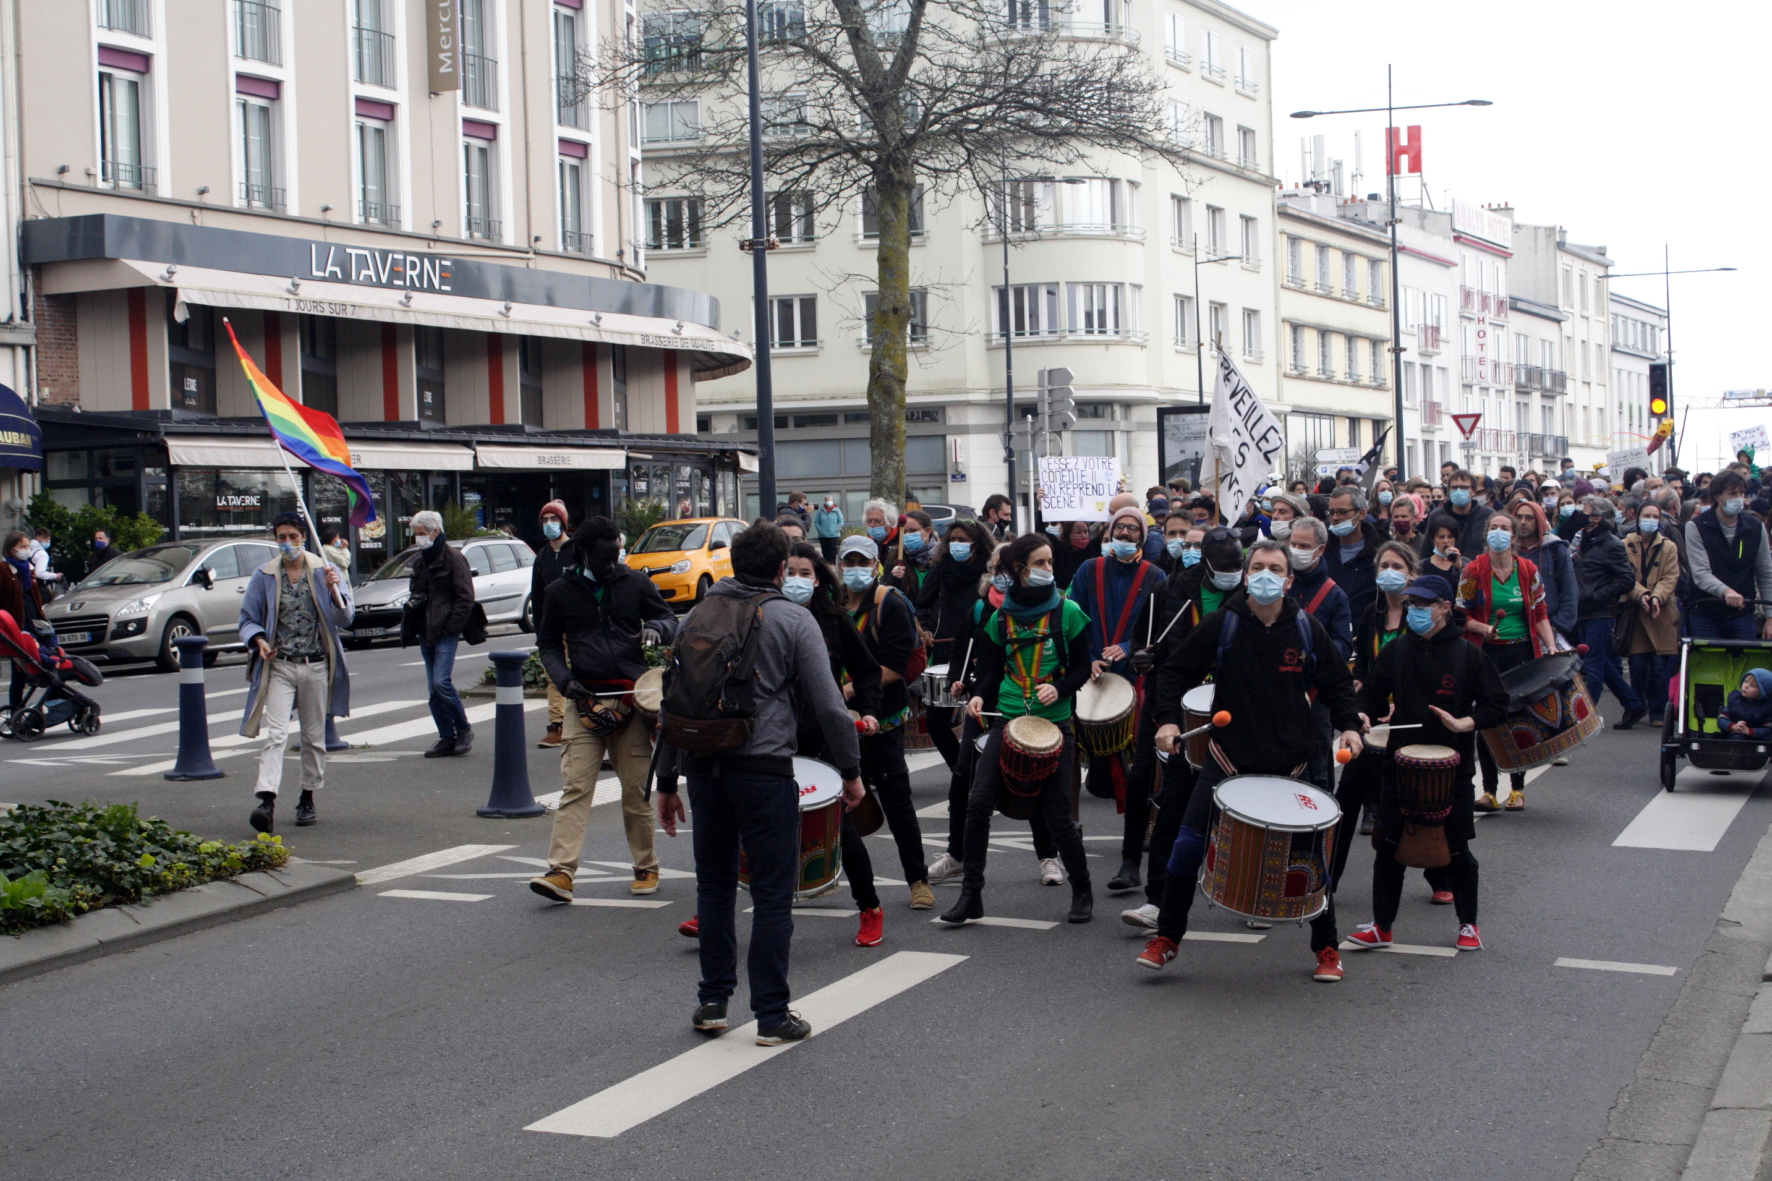 Manif-culture-Brest-20-03-21-113